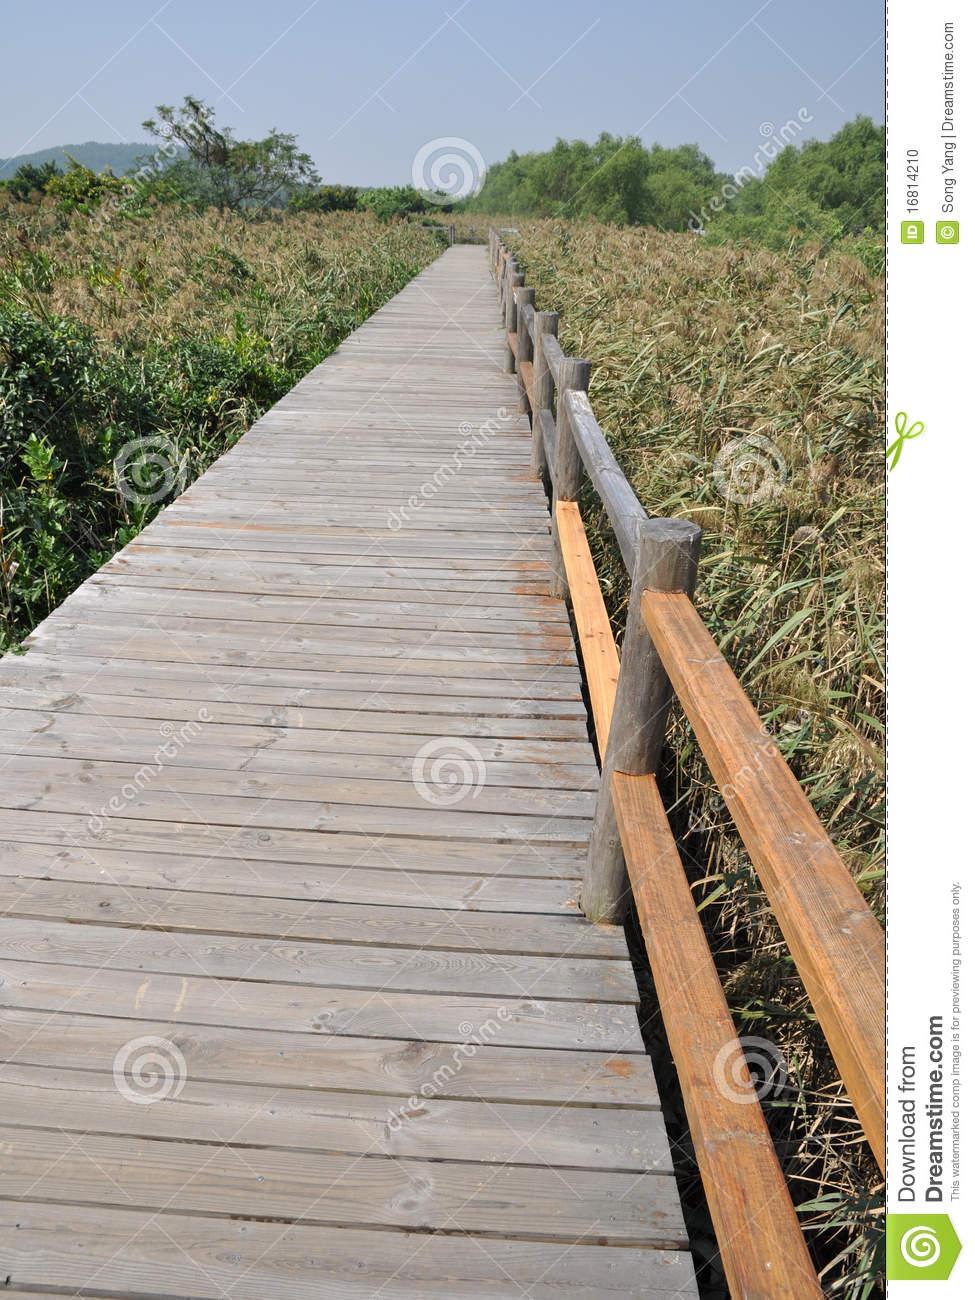 Wood Plank Road Stock Photo.